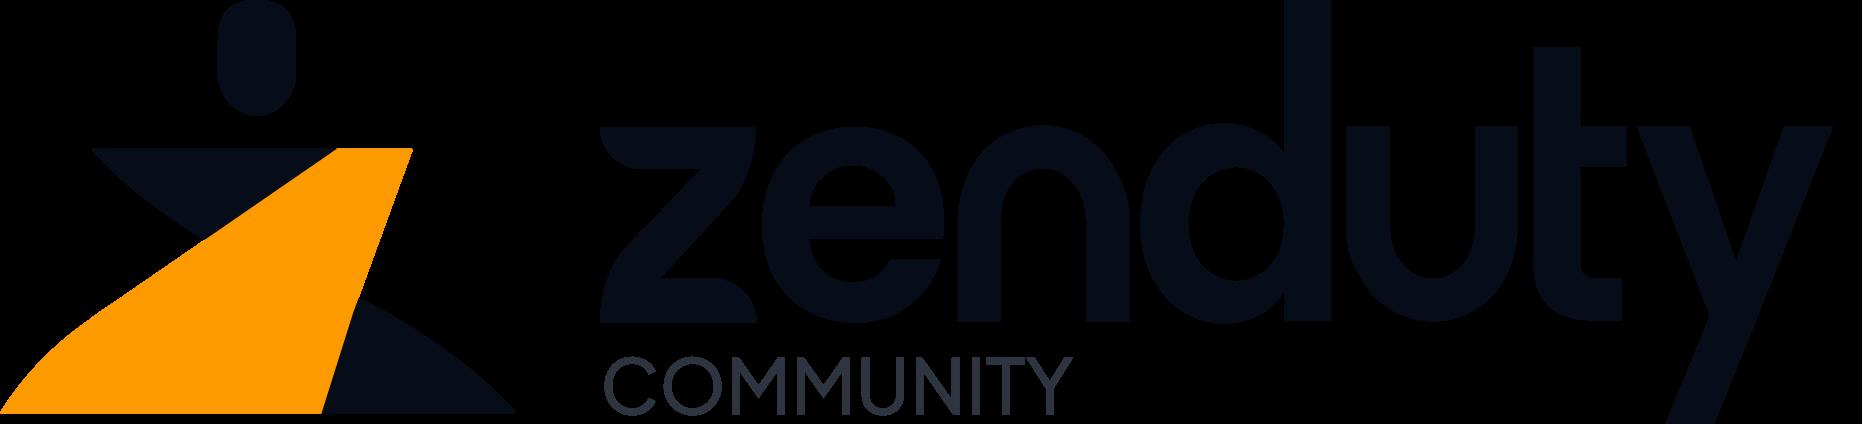 Zenduty Community